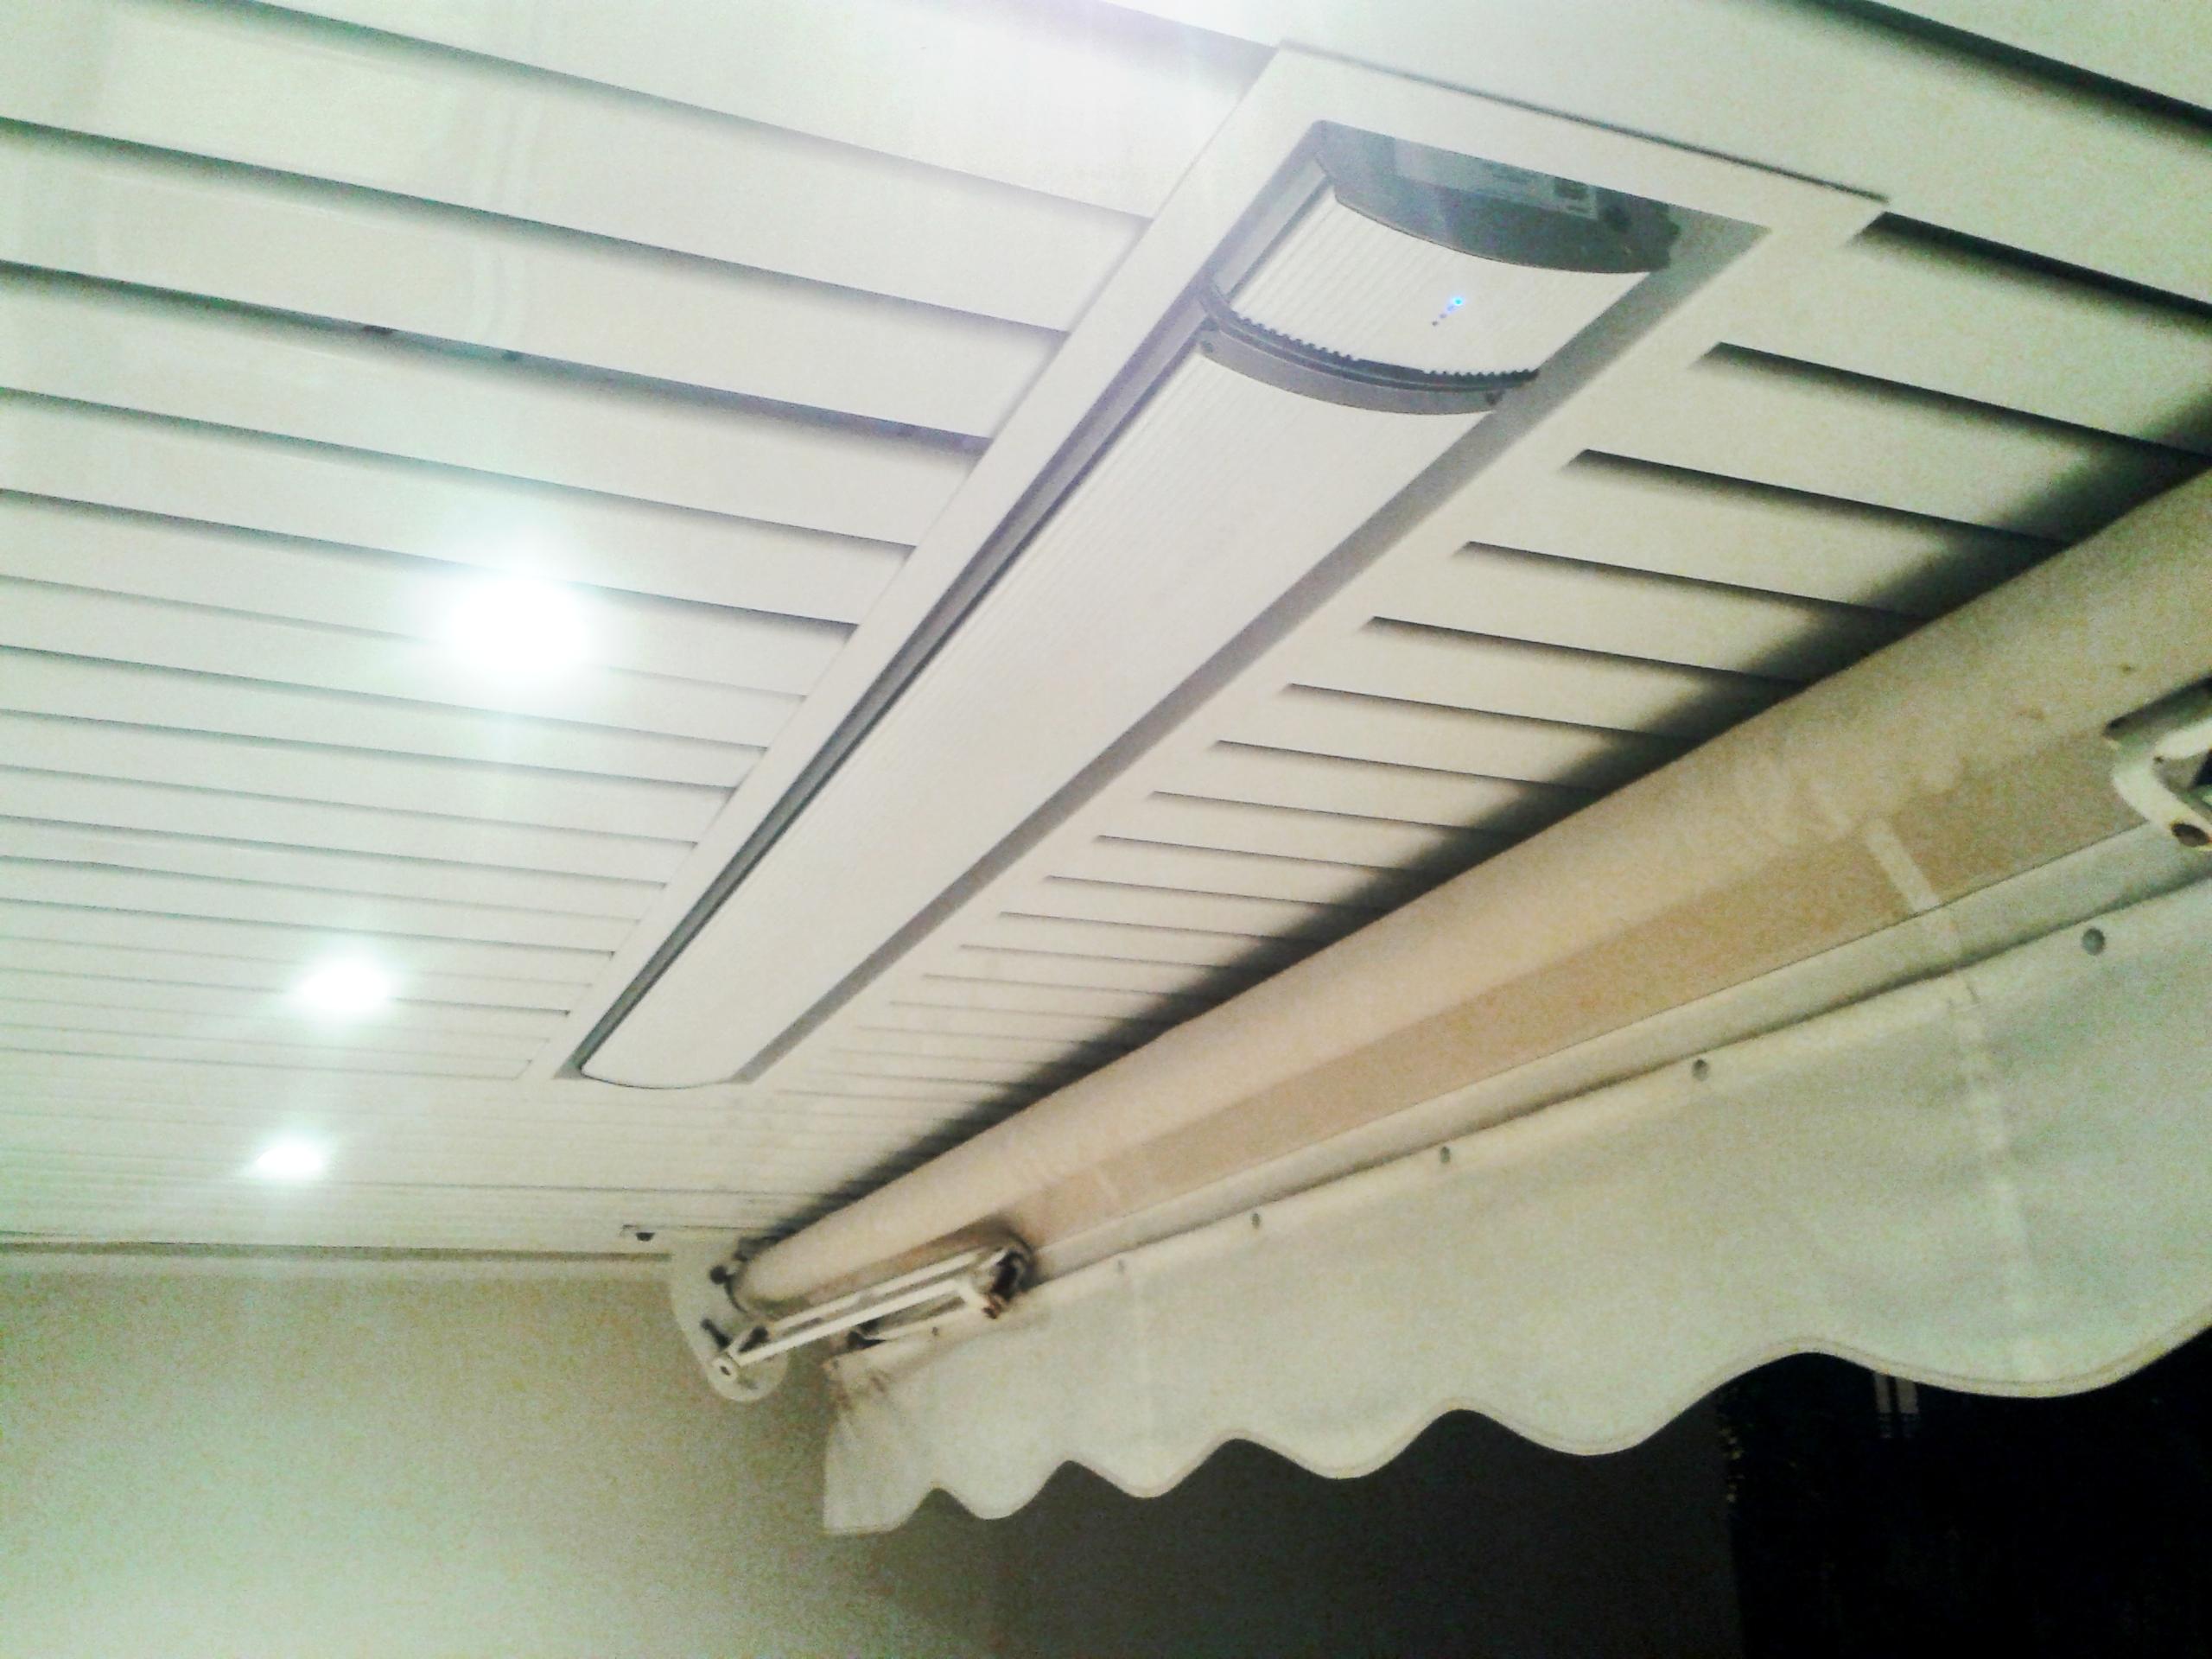 Installation climatisation gainable chauffage par le plafond avis - Chauffage au plafond ...